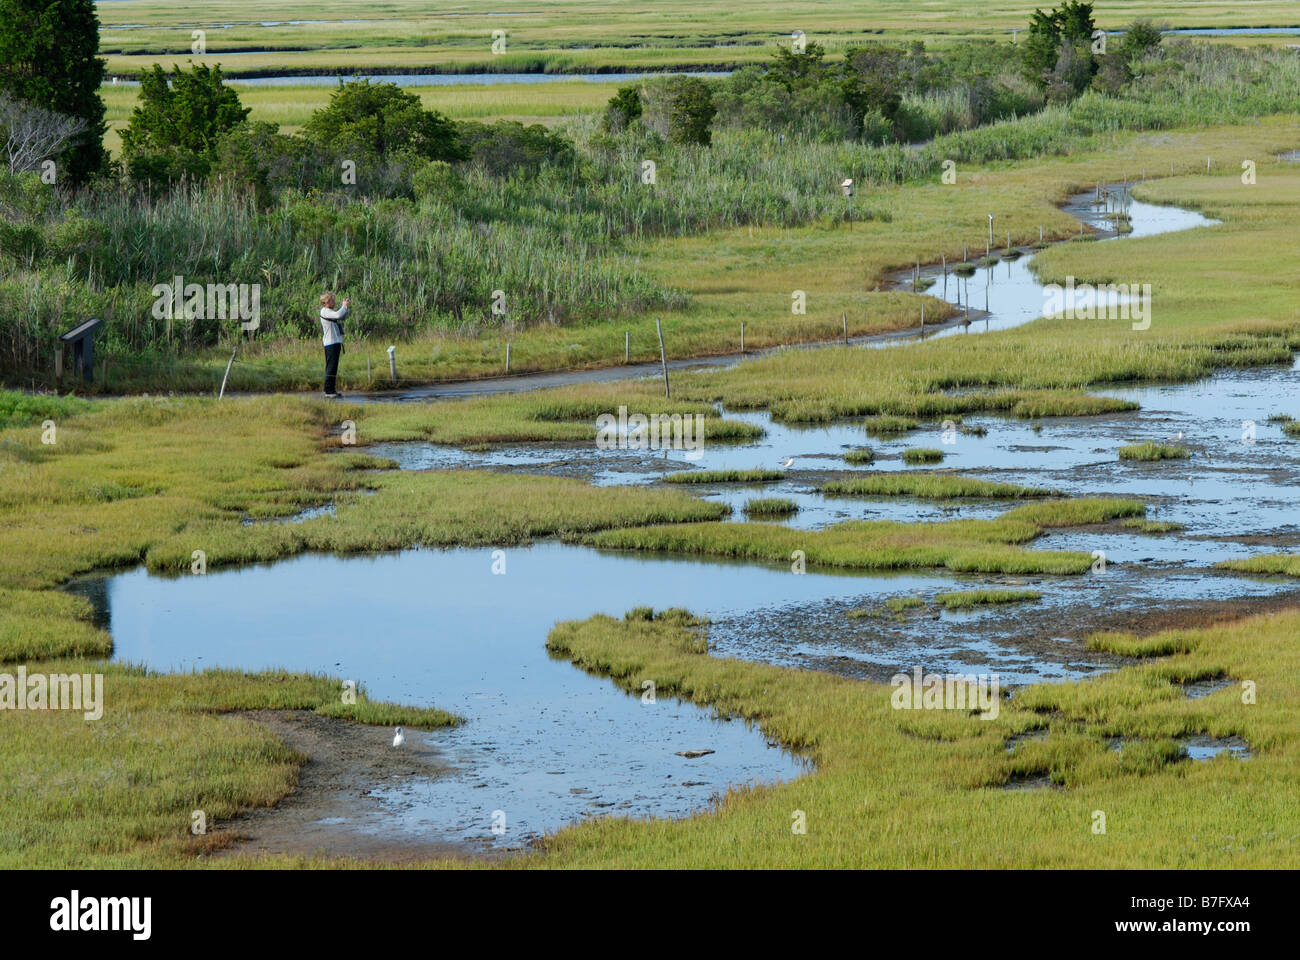 Person observing a wetland salt marsh ecosystem, Wetlands Institute, 'Stone Harbor', NJ - Stock Image